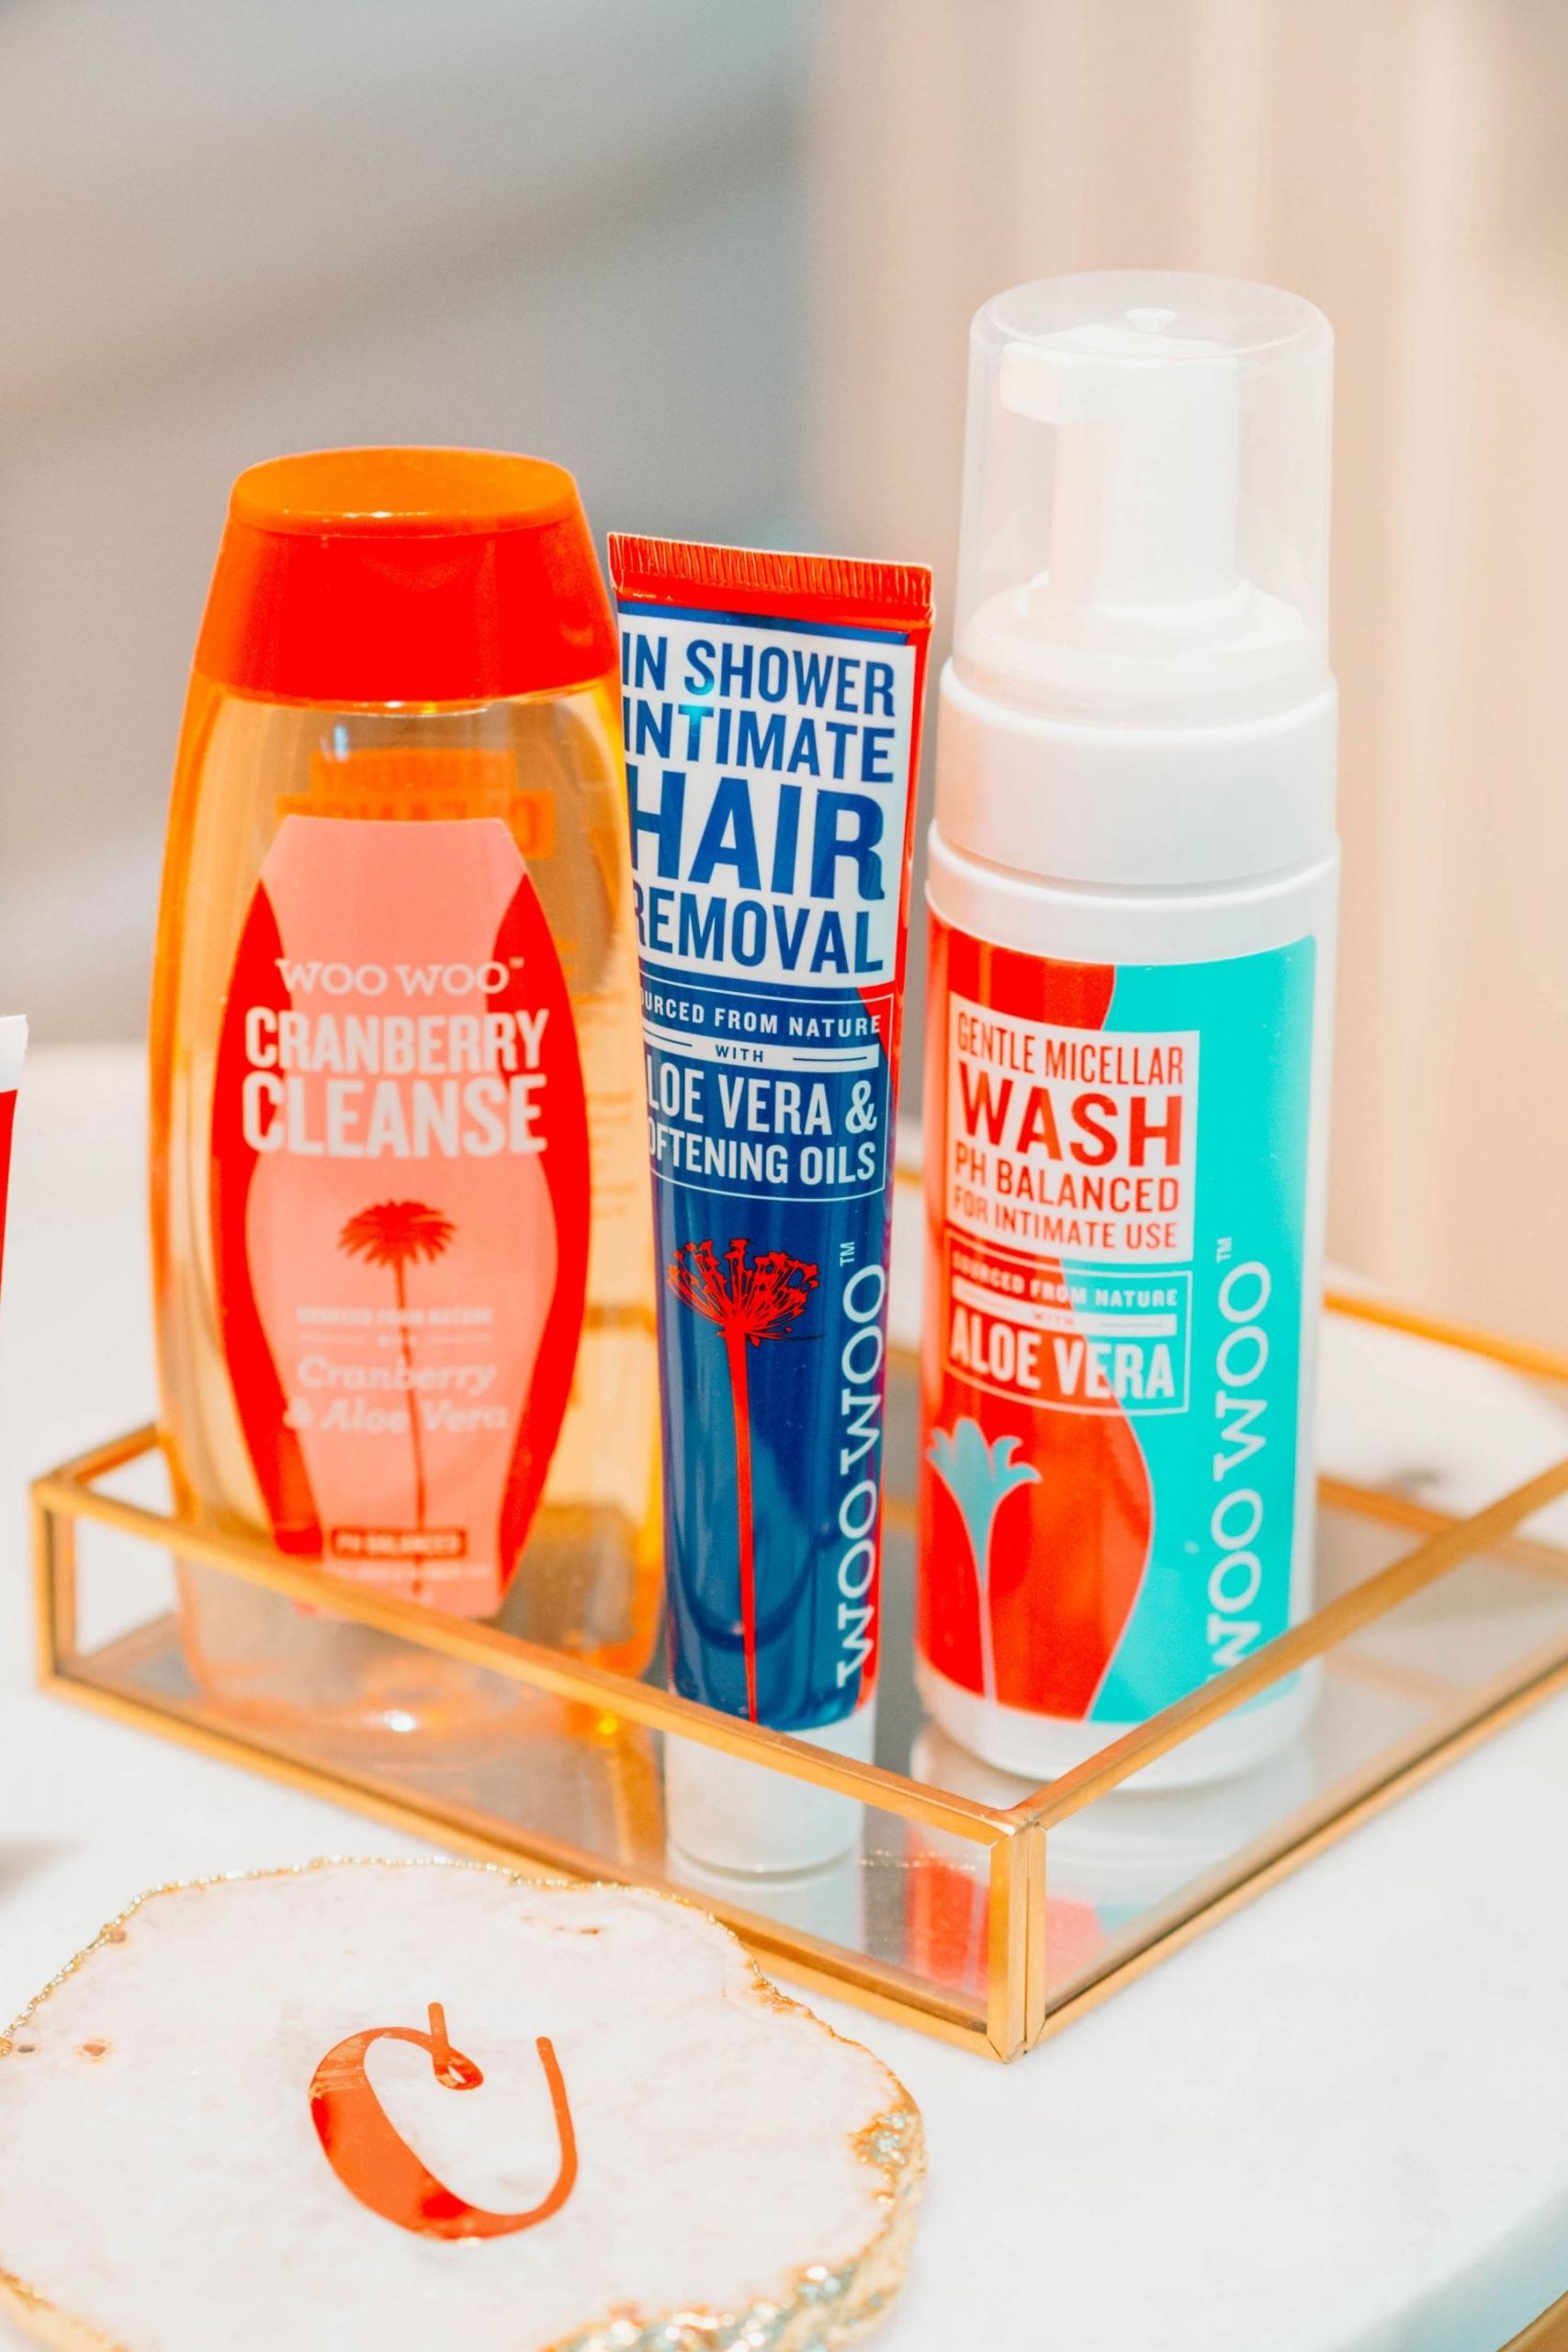 Woo Woo feminine hygiene products fully reviewed